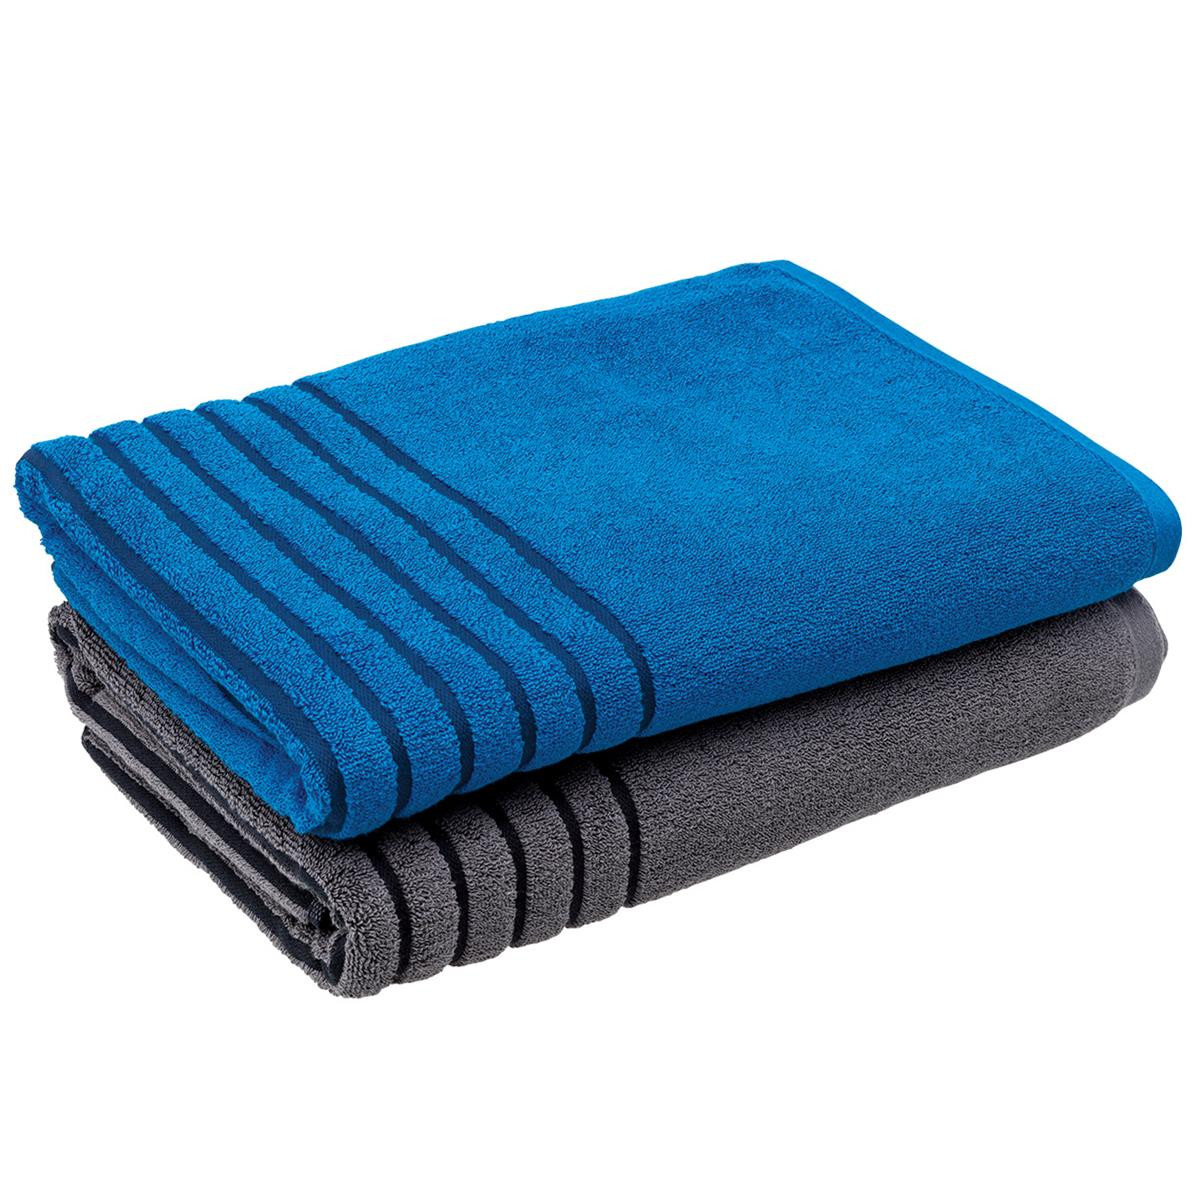 Promotional Product Reversable Towel